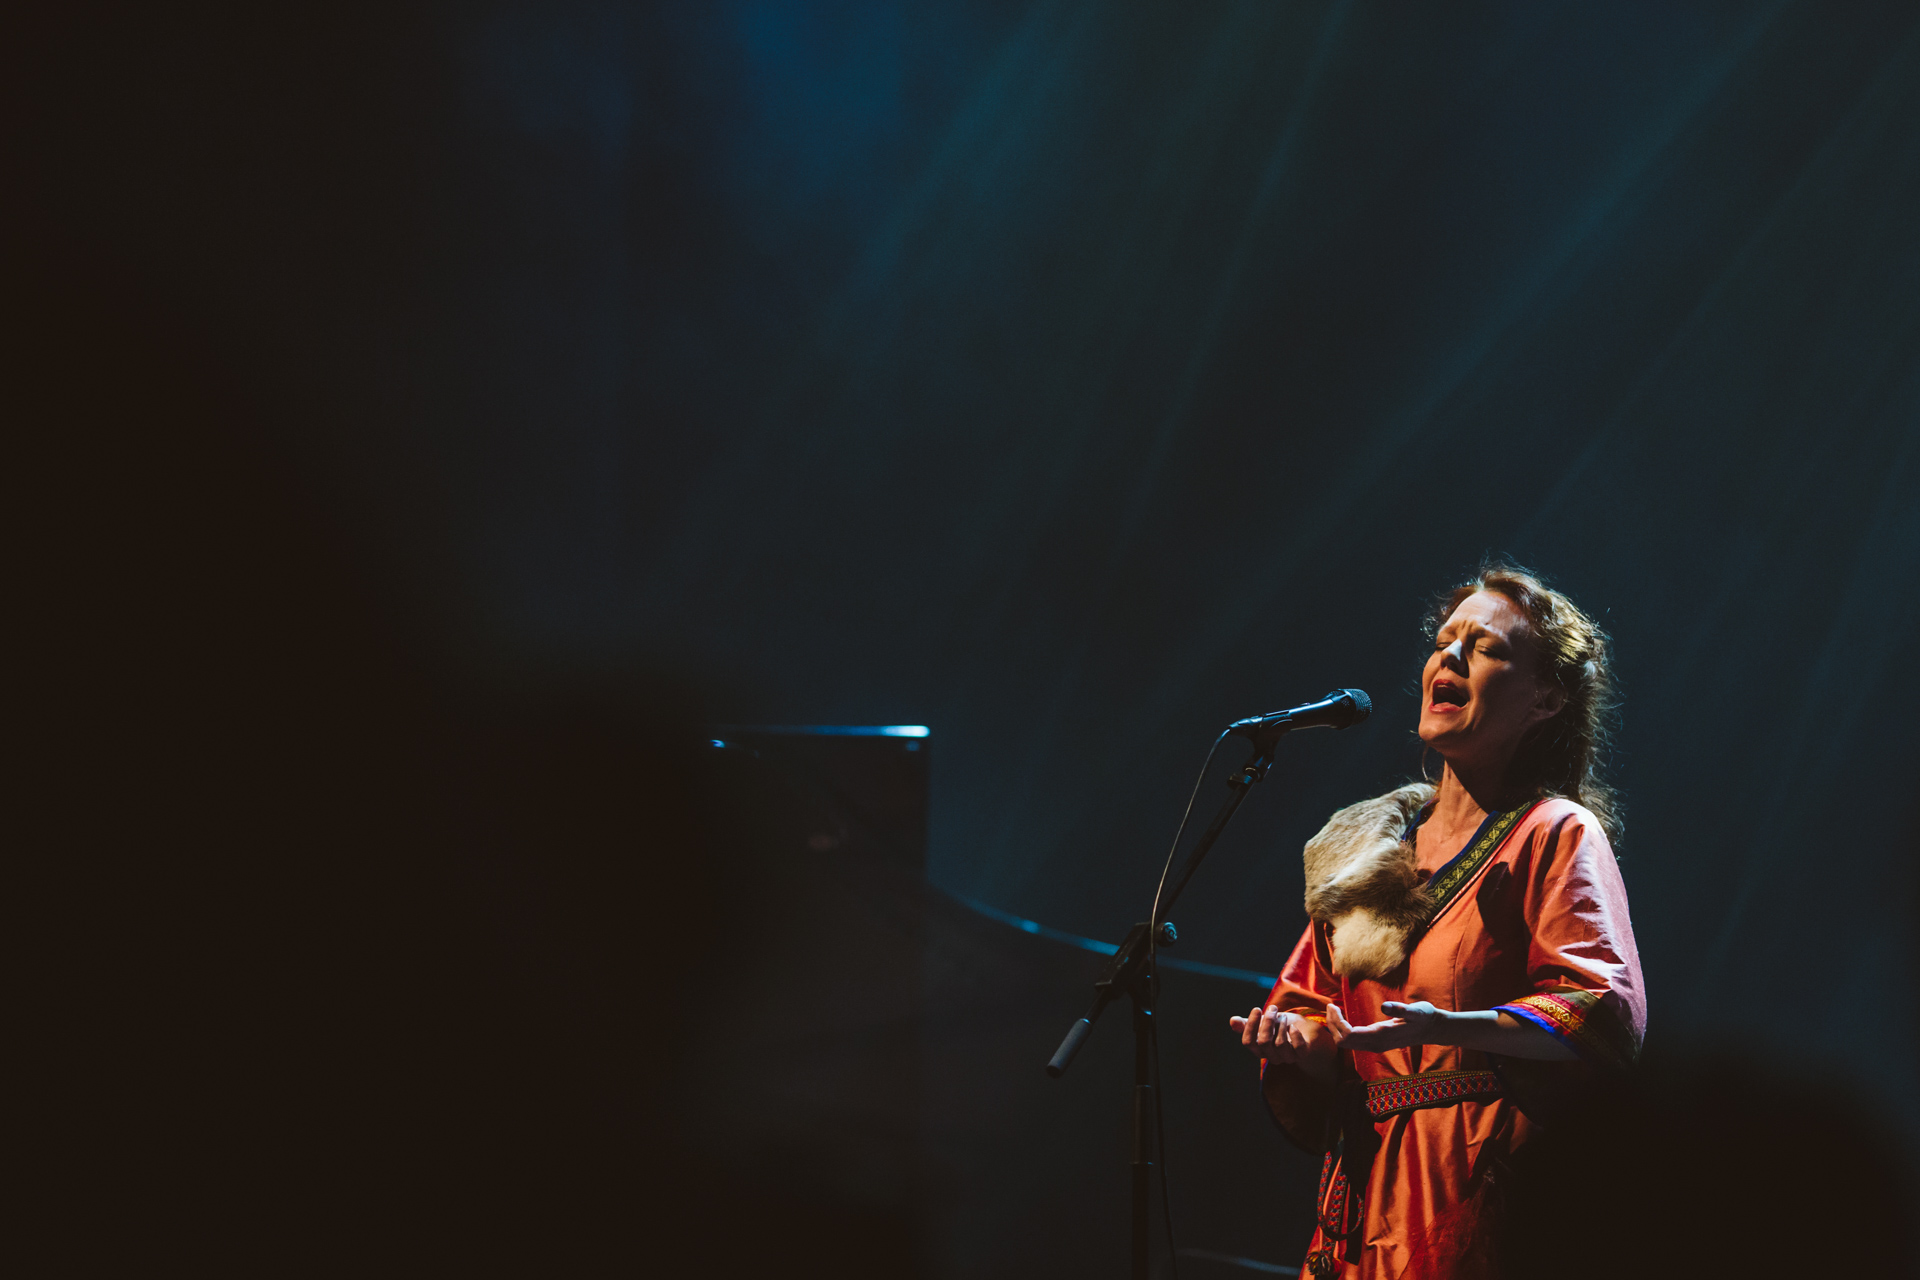 WEB-Elin-Teilus-concert-fotograf-Zita Marias-051.jpeg